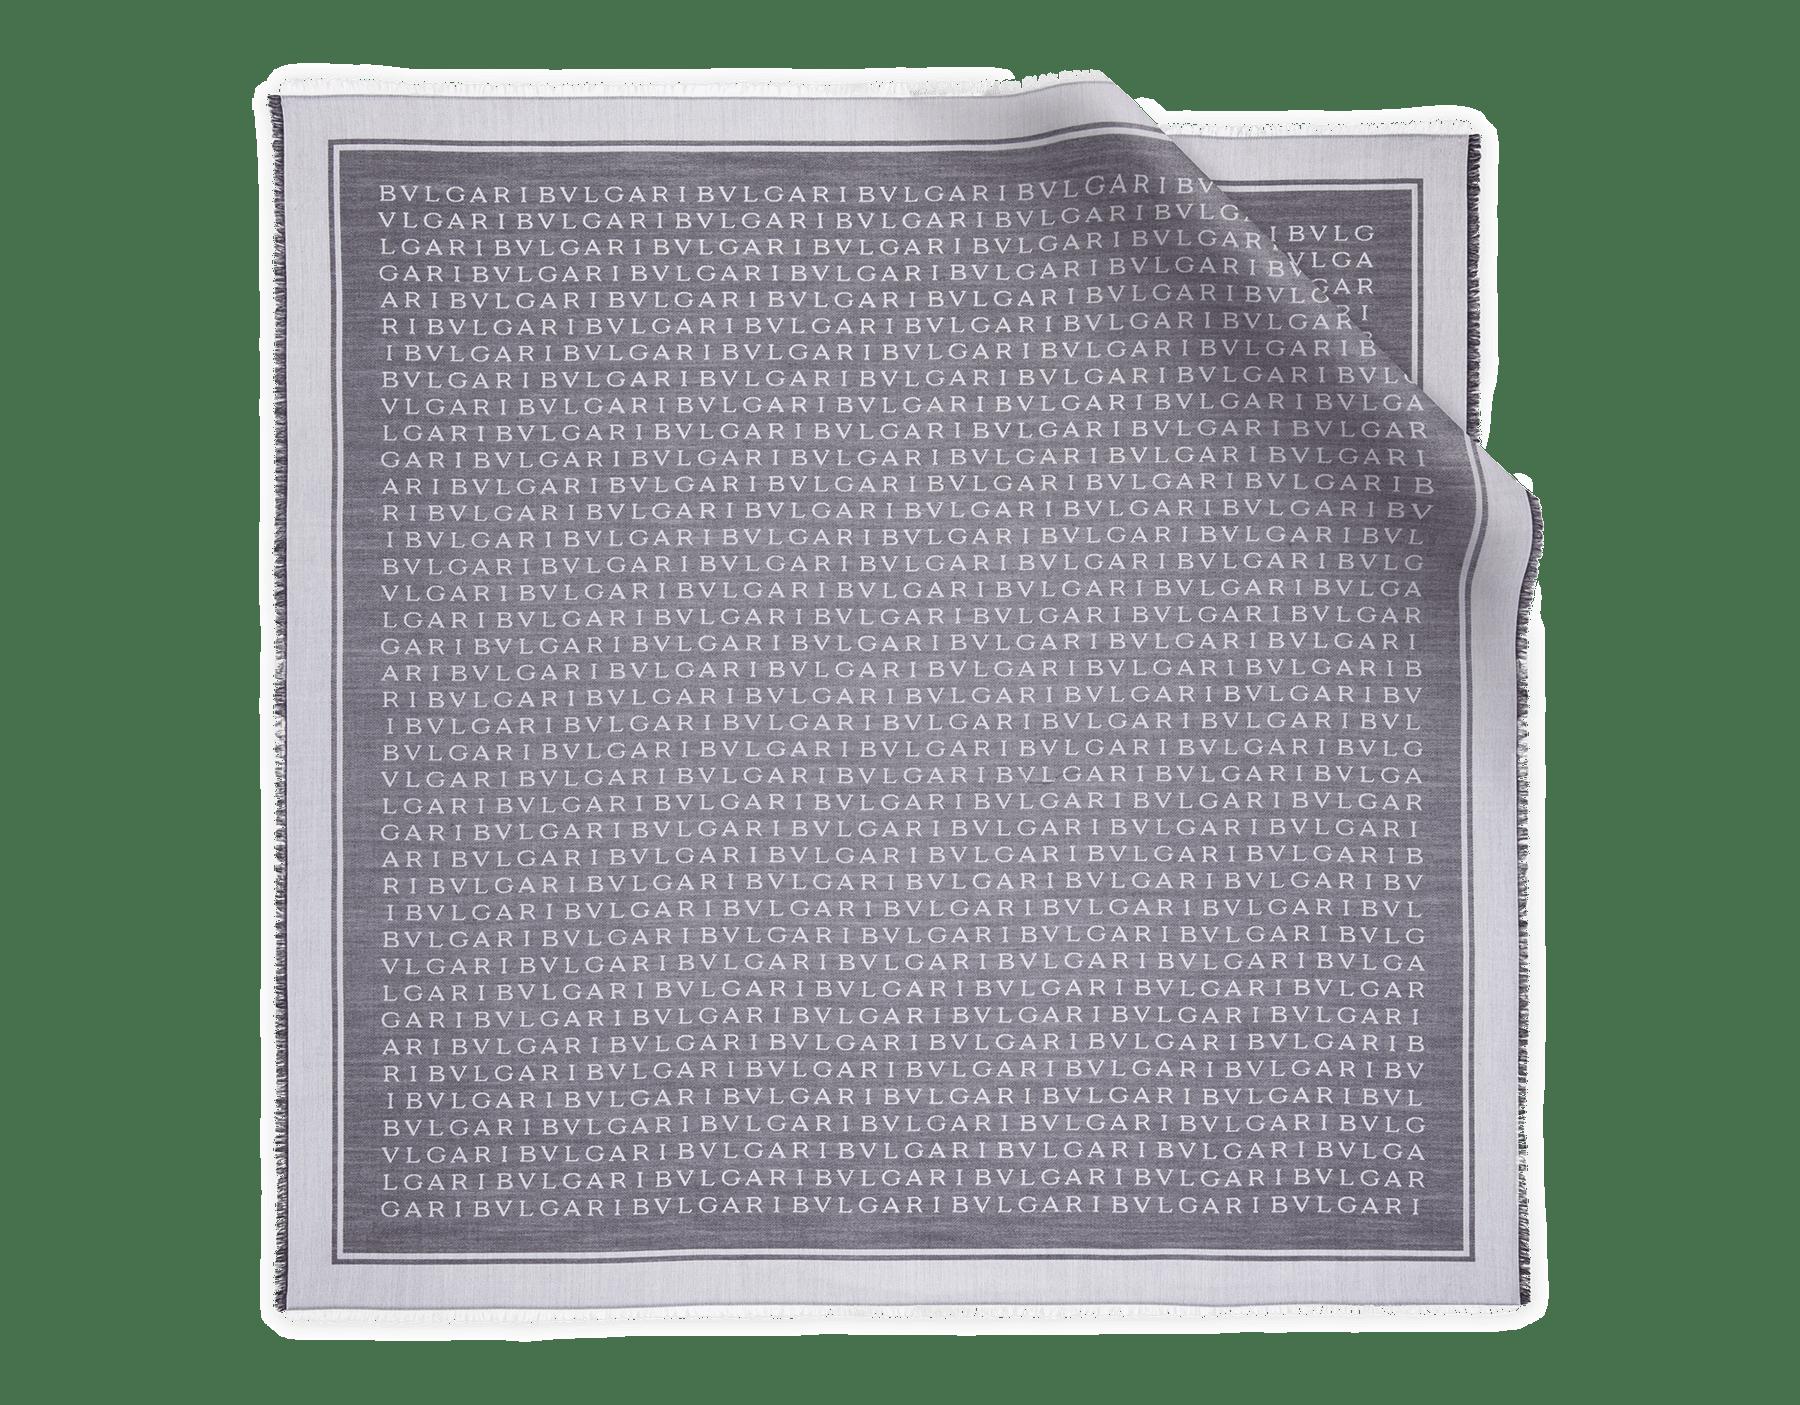 Pañuelo Lettere Maxi XL negro de lana de seda fina. 244235 image 1